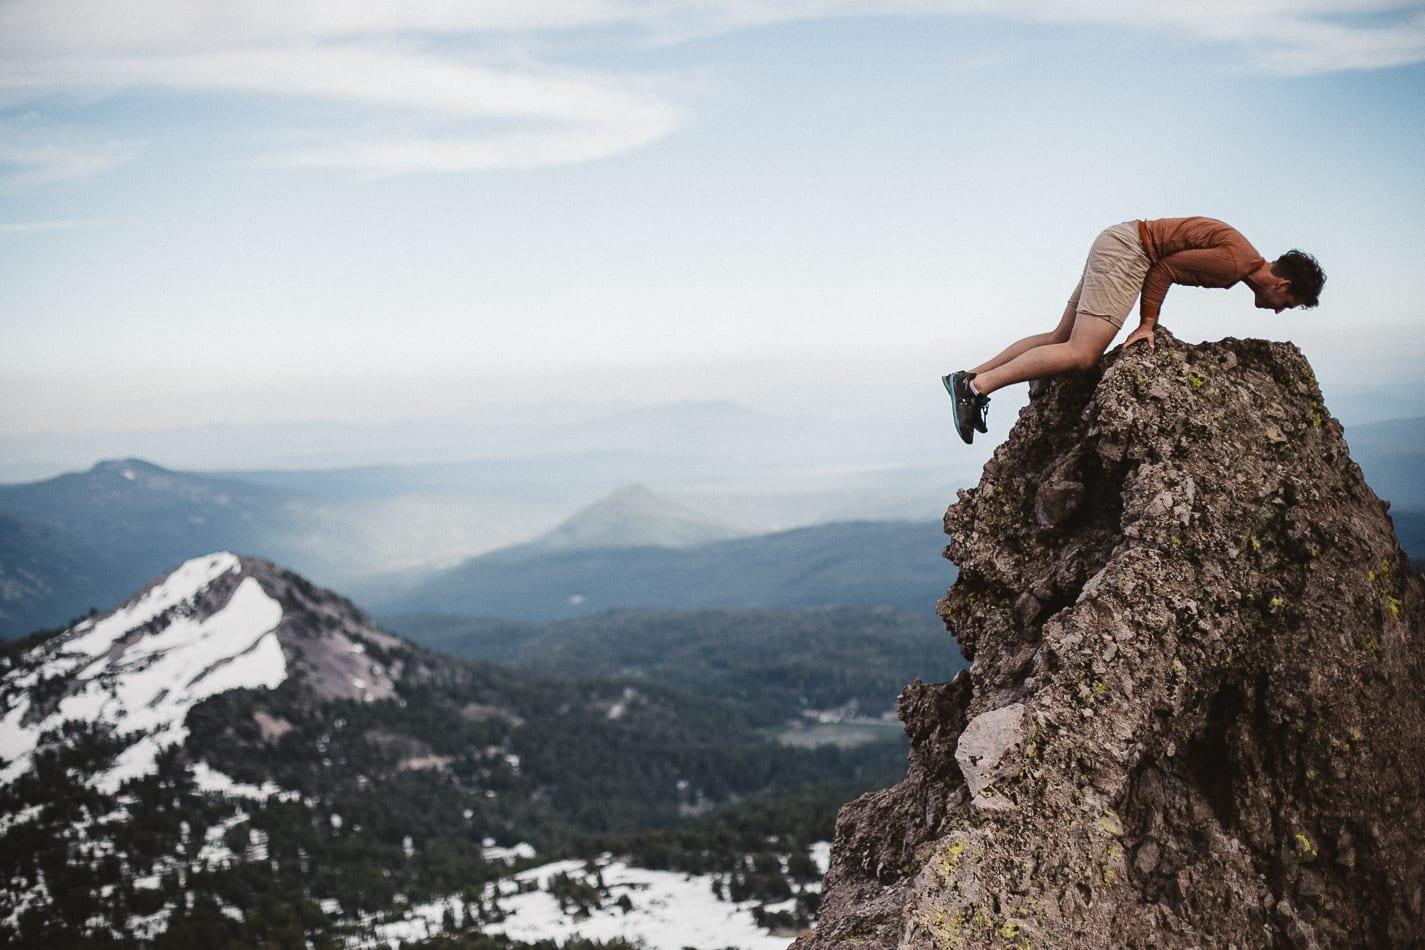 mount-lassen-california-adventure-lifestyle-photorapher-20